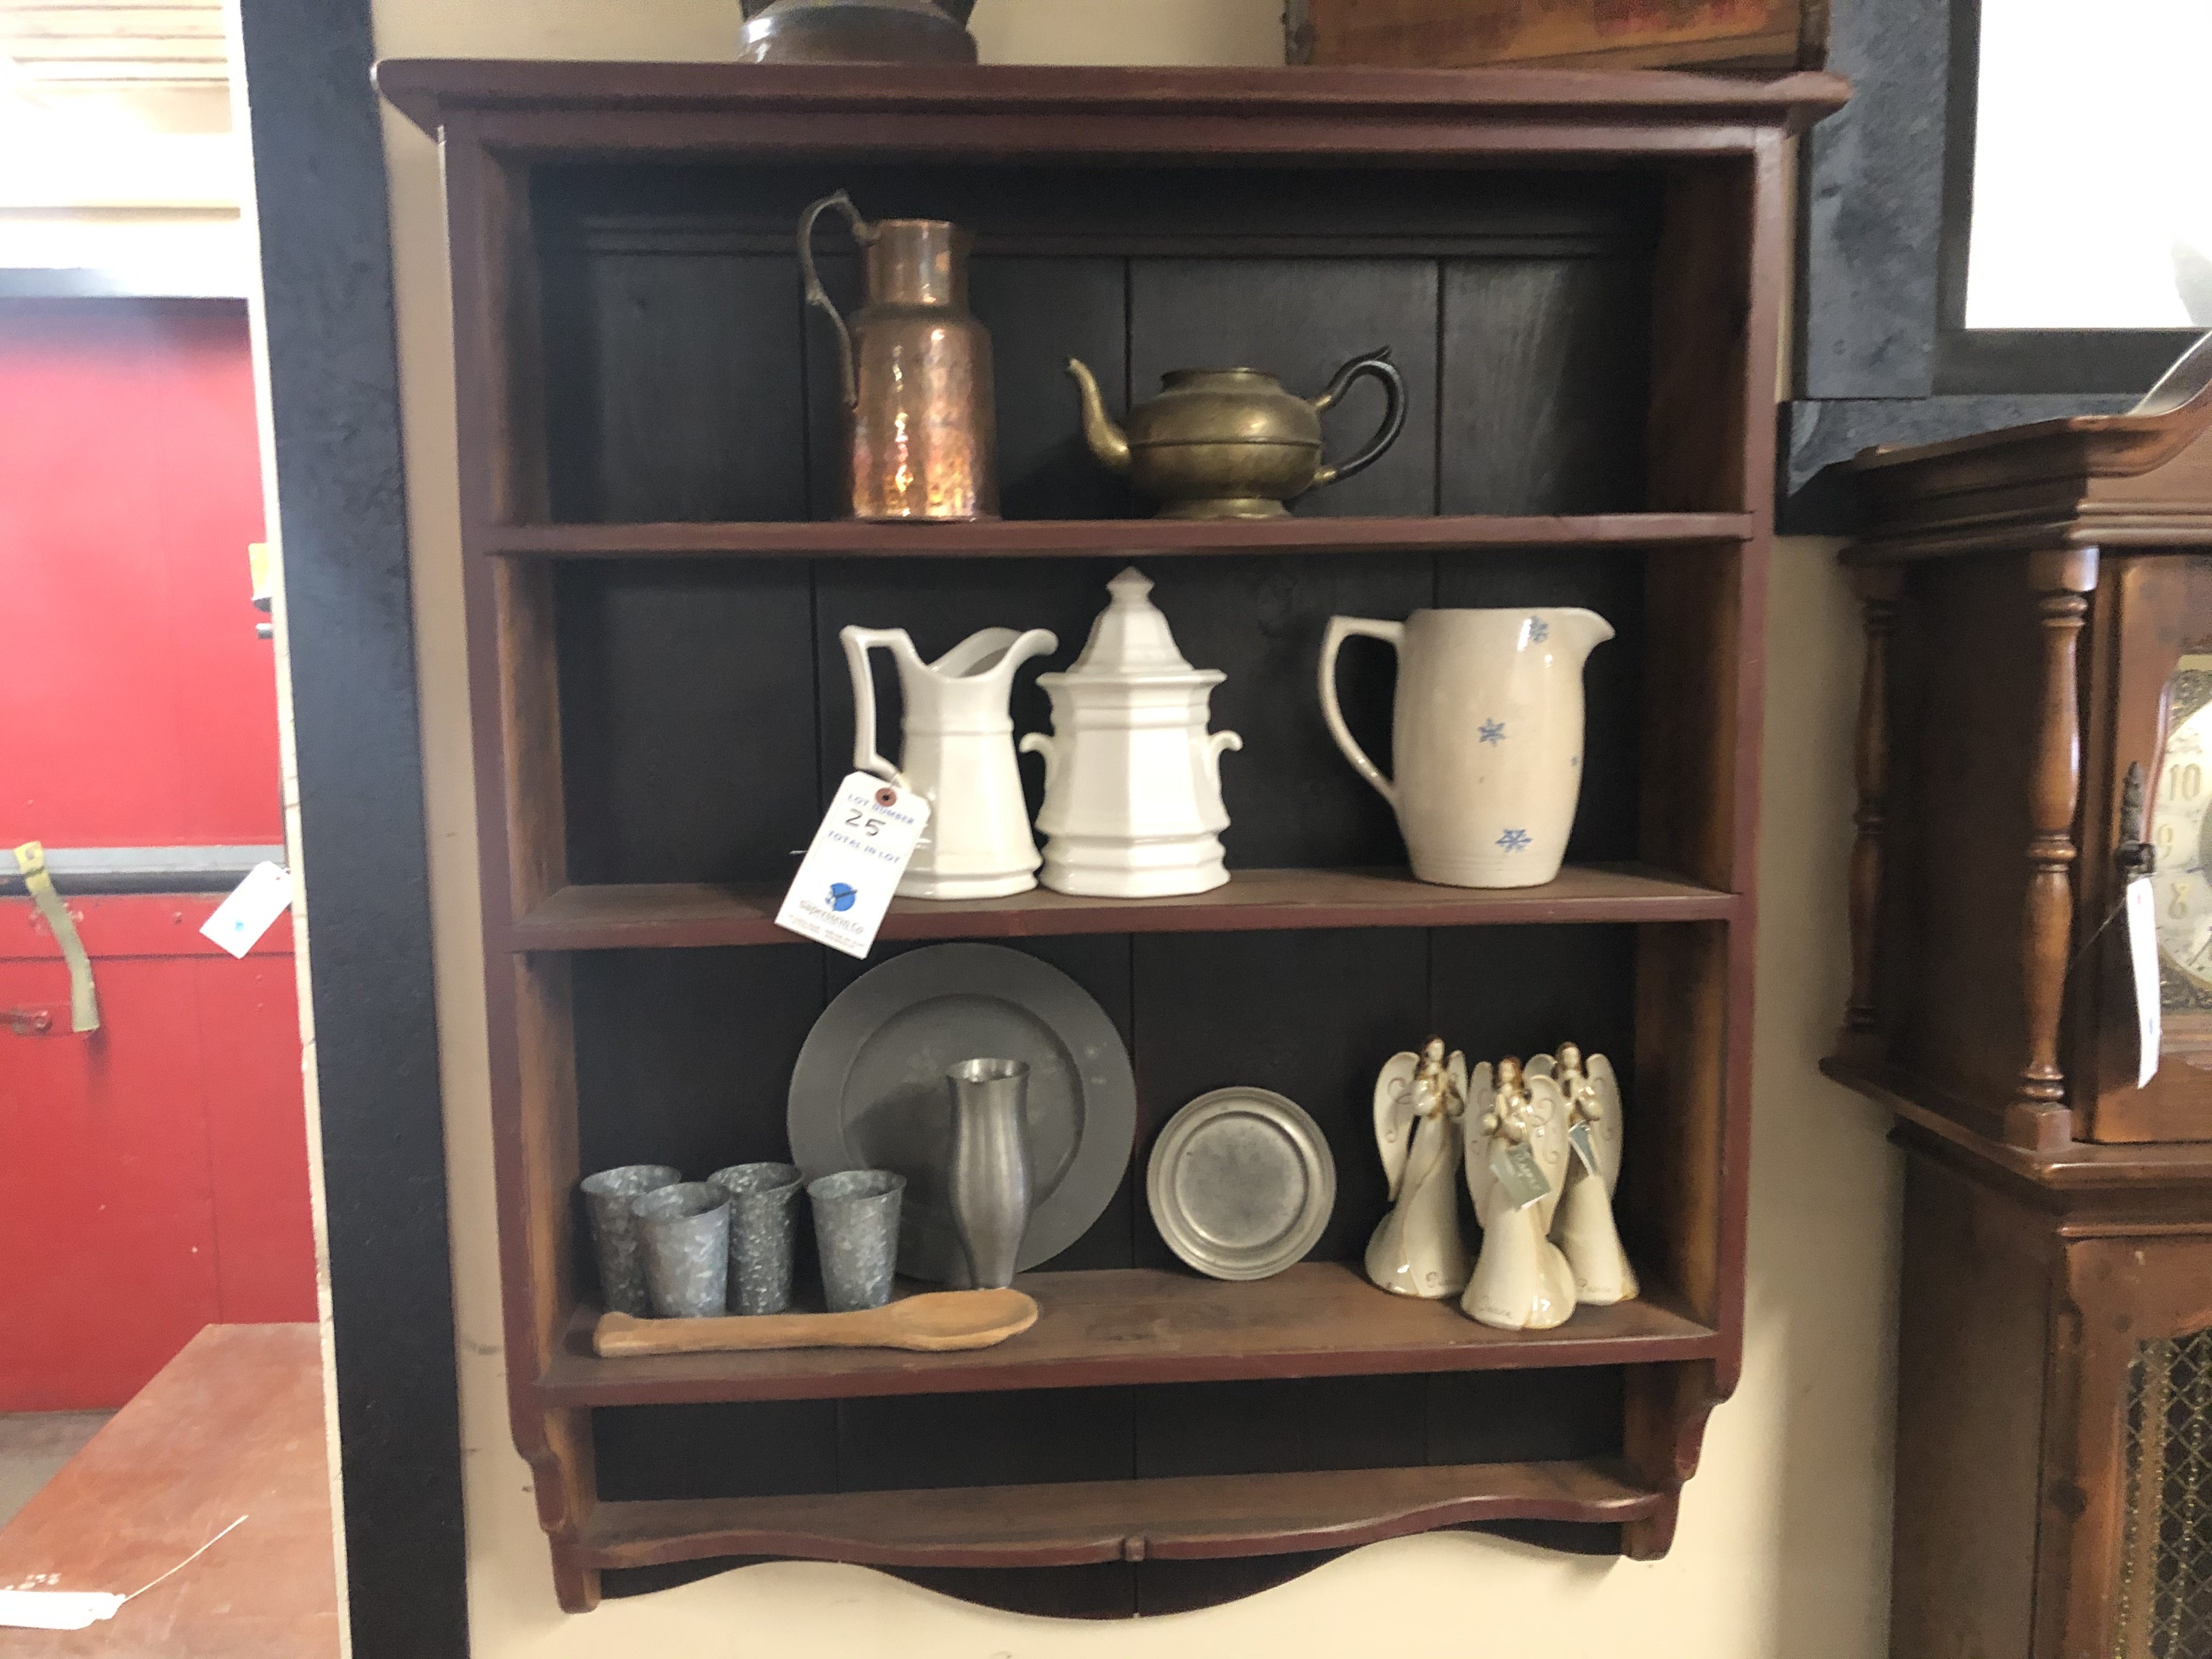 Wall Mounted 3 Section Shelf w/Porcelain Mugs & Galvanized Antiques